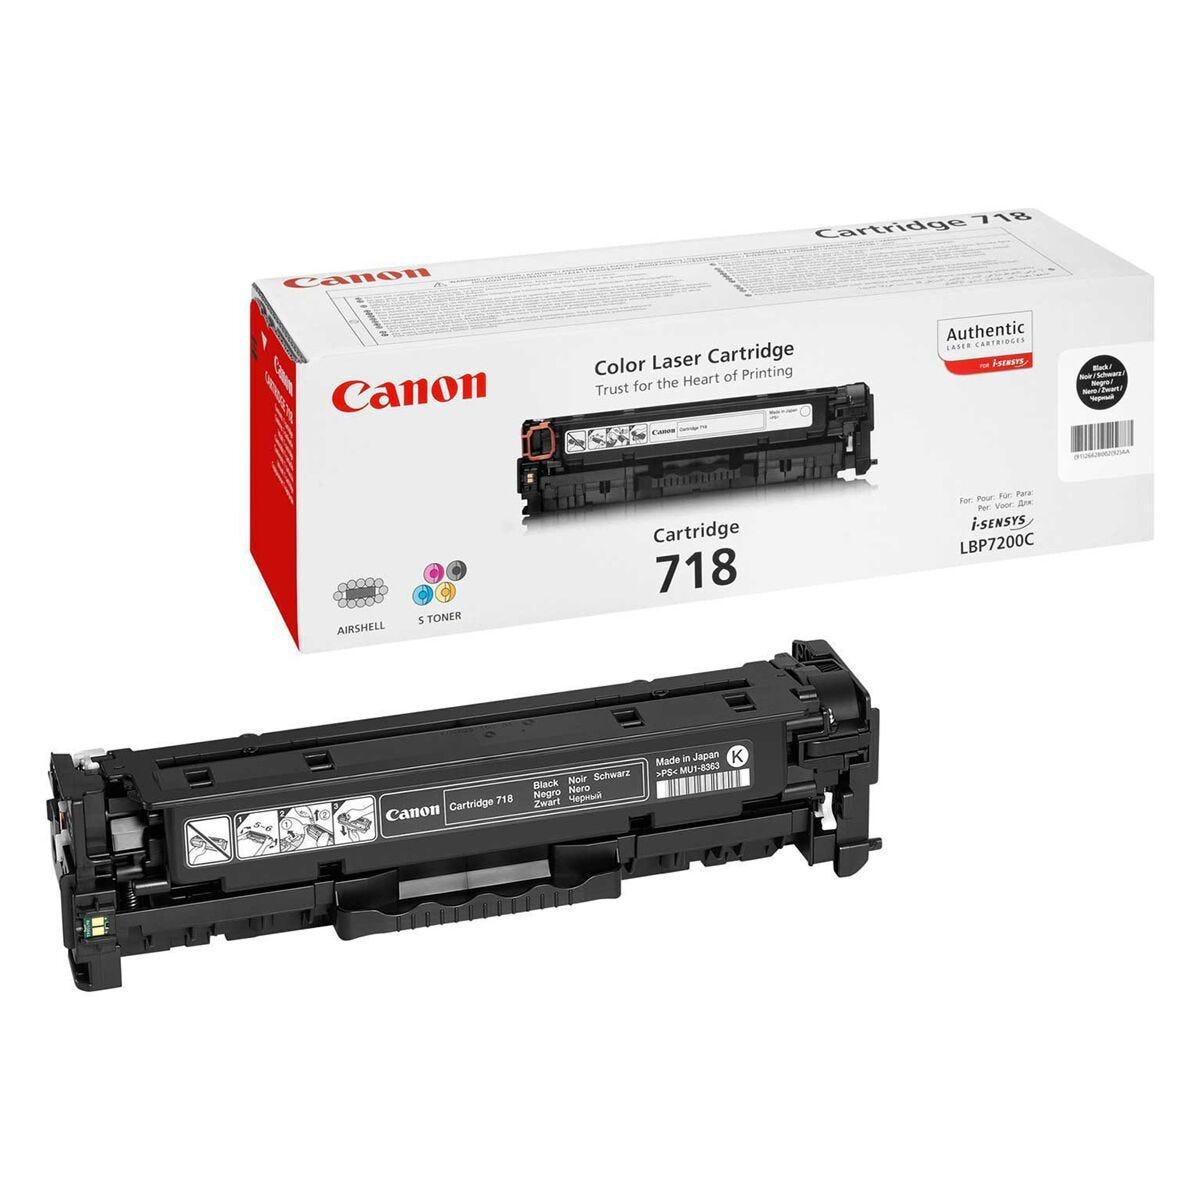 Canon 718 Printer Ink Toner Cartridge 7200CDN